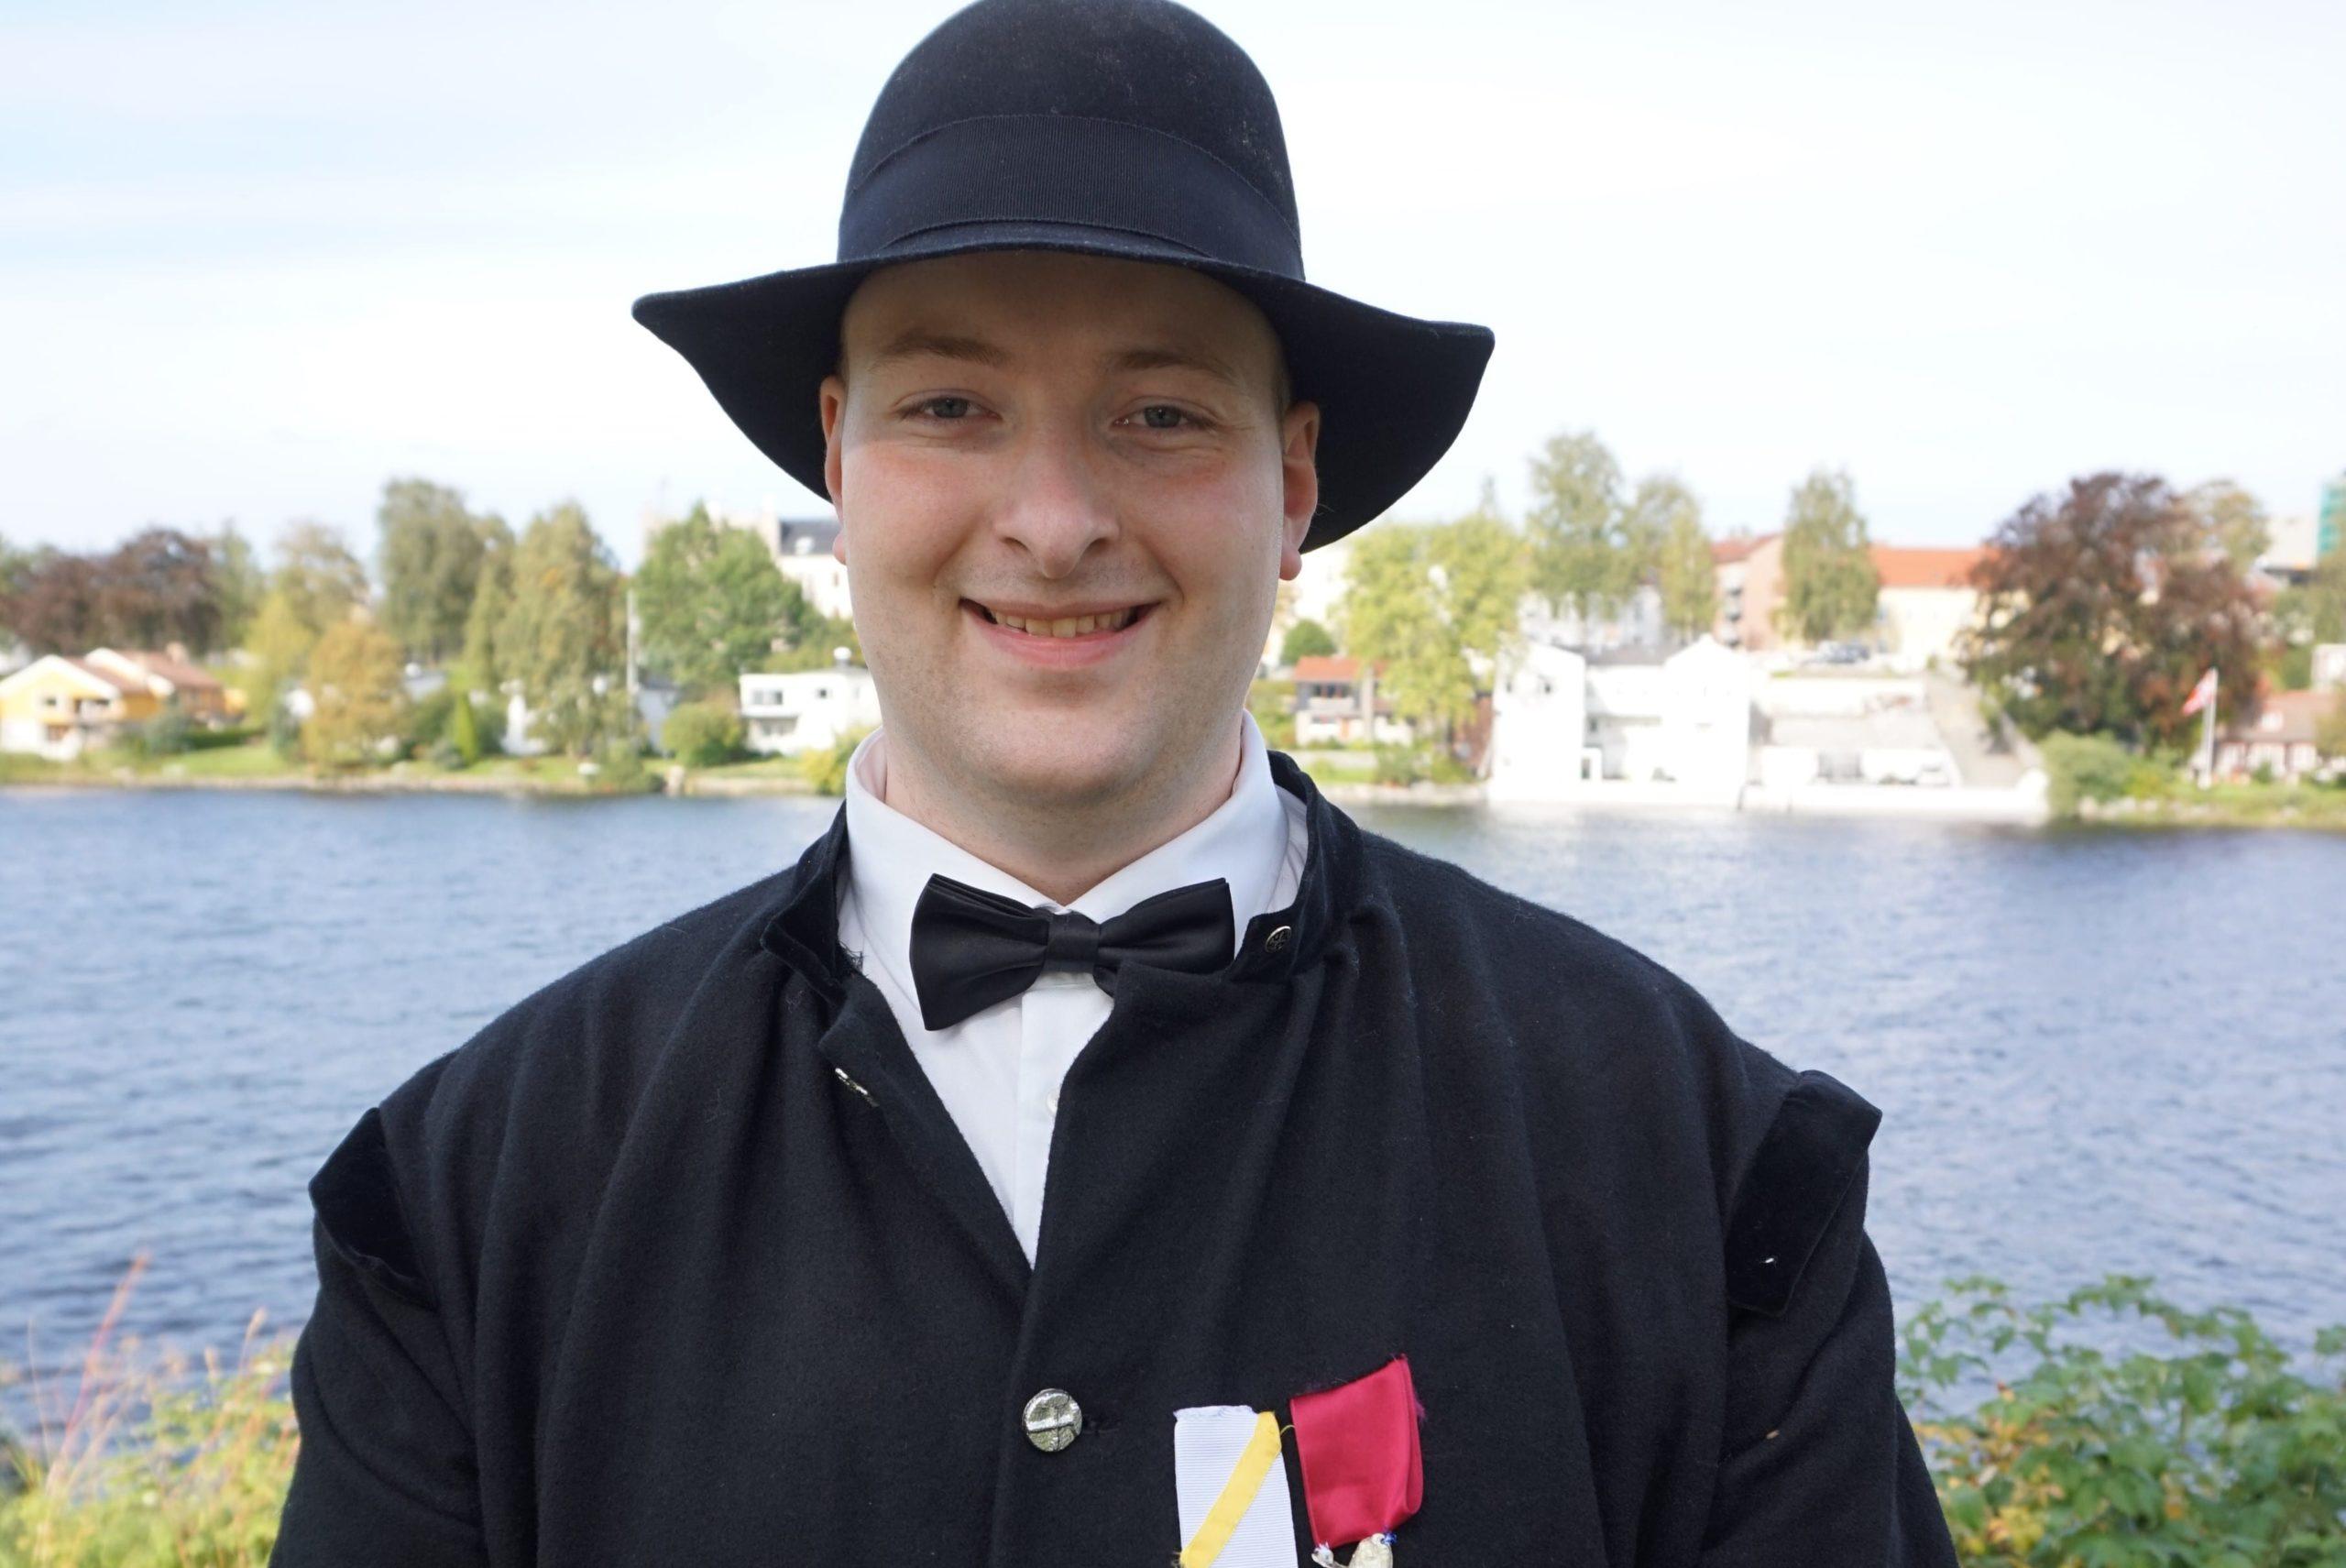 Kjetil Aarflot Storaas